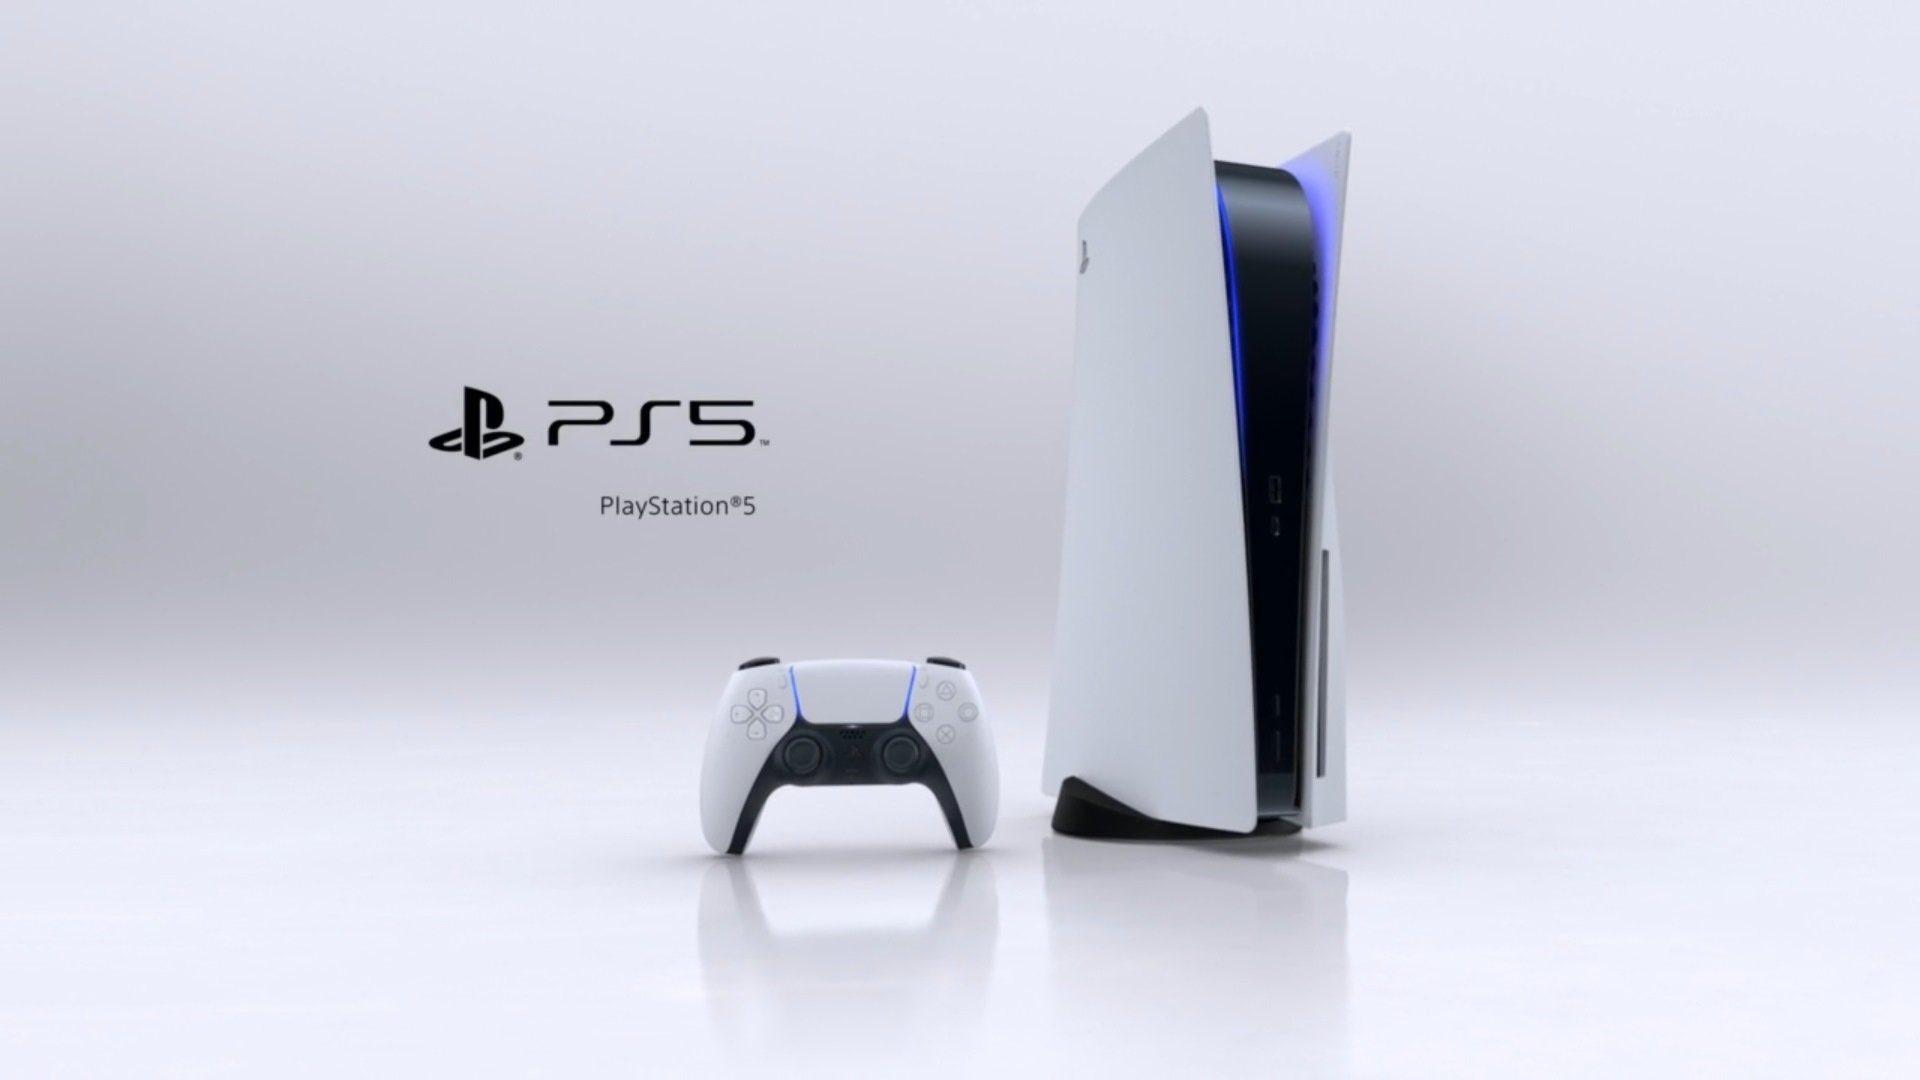 Sony divulga visual do novo Playstation 5 | VEJA